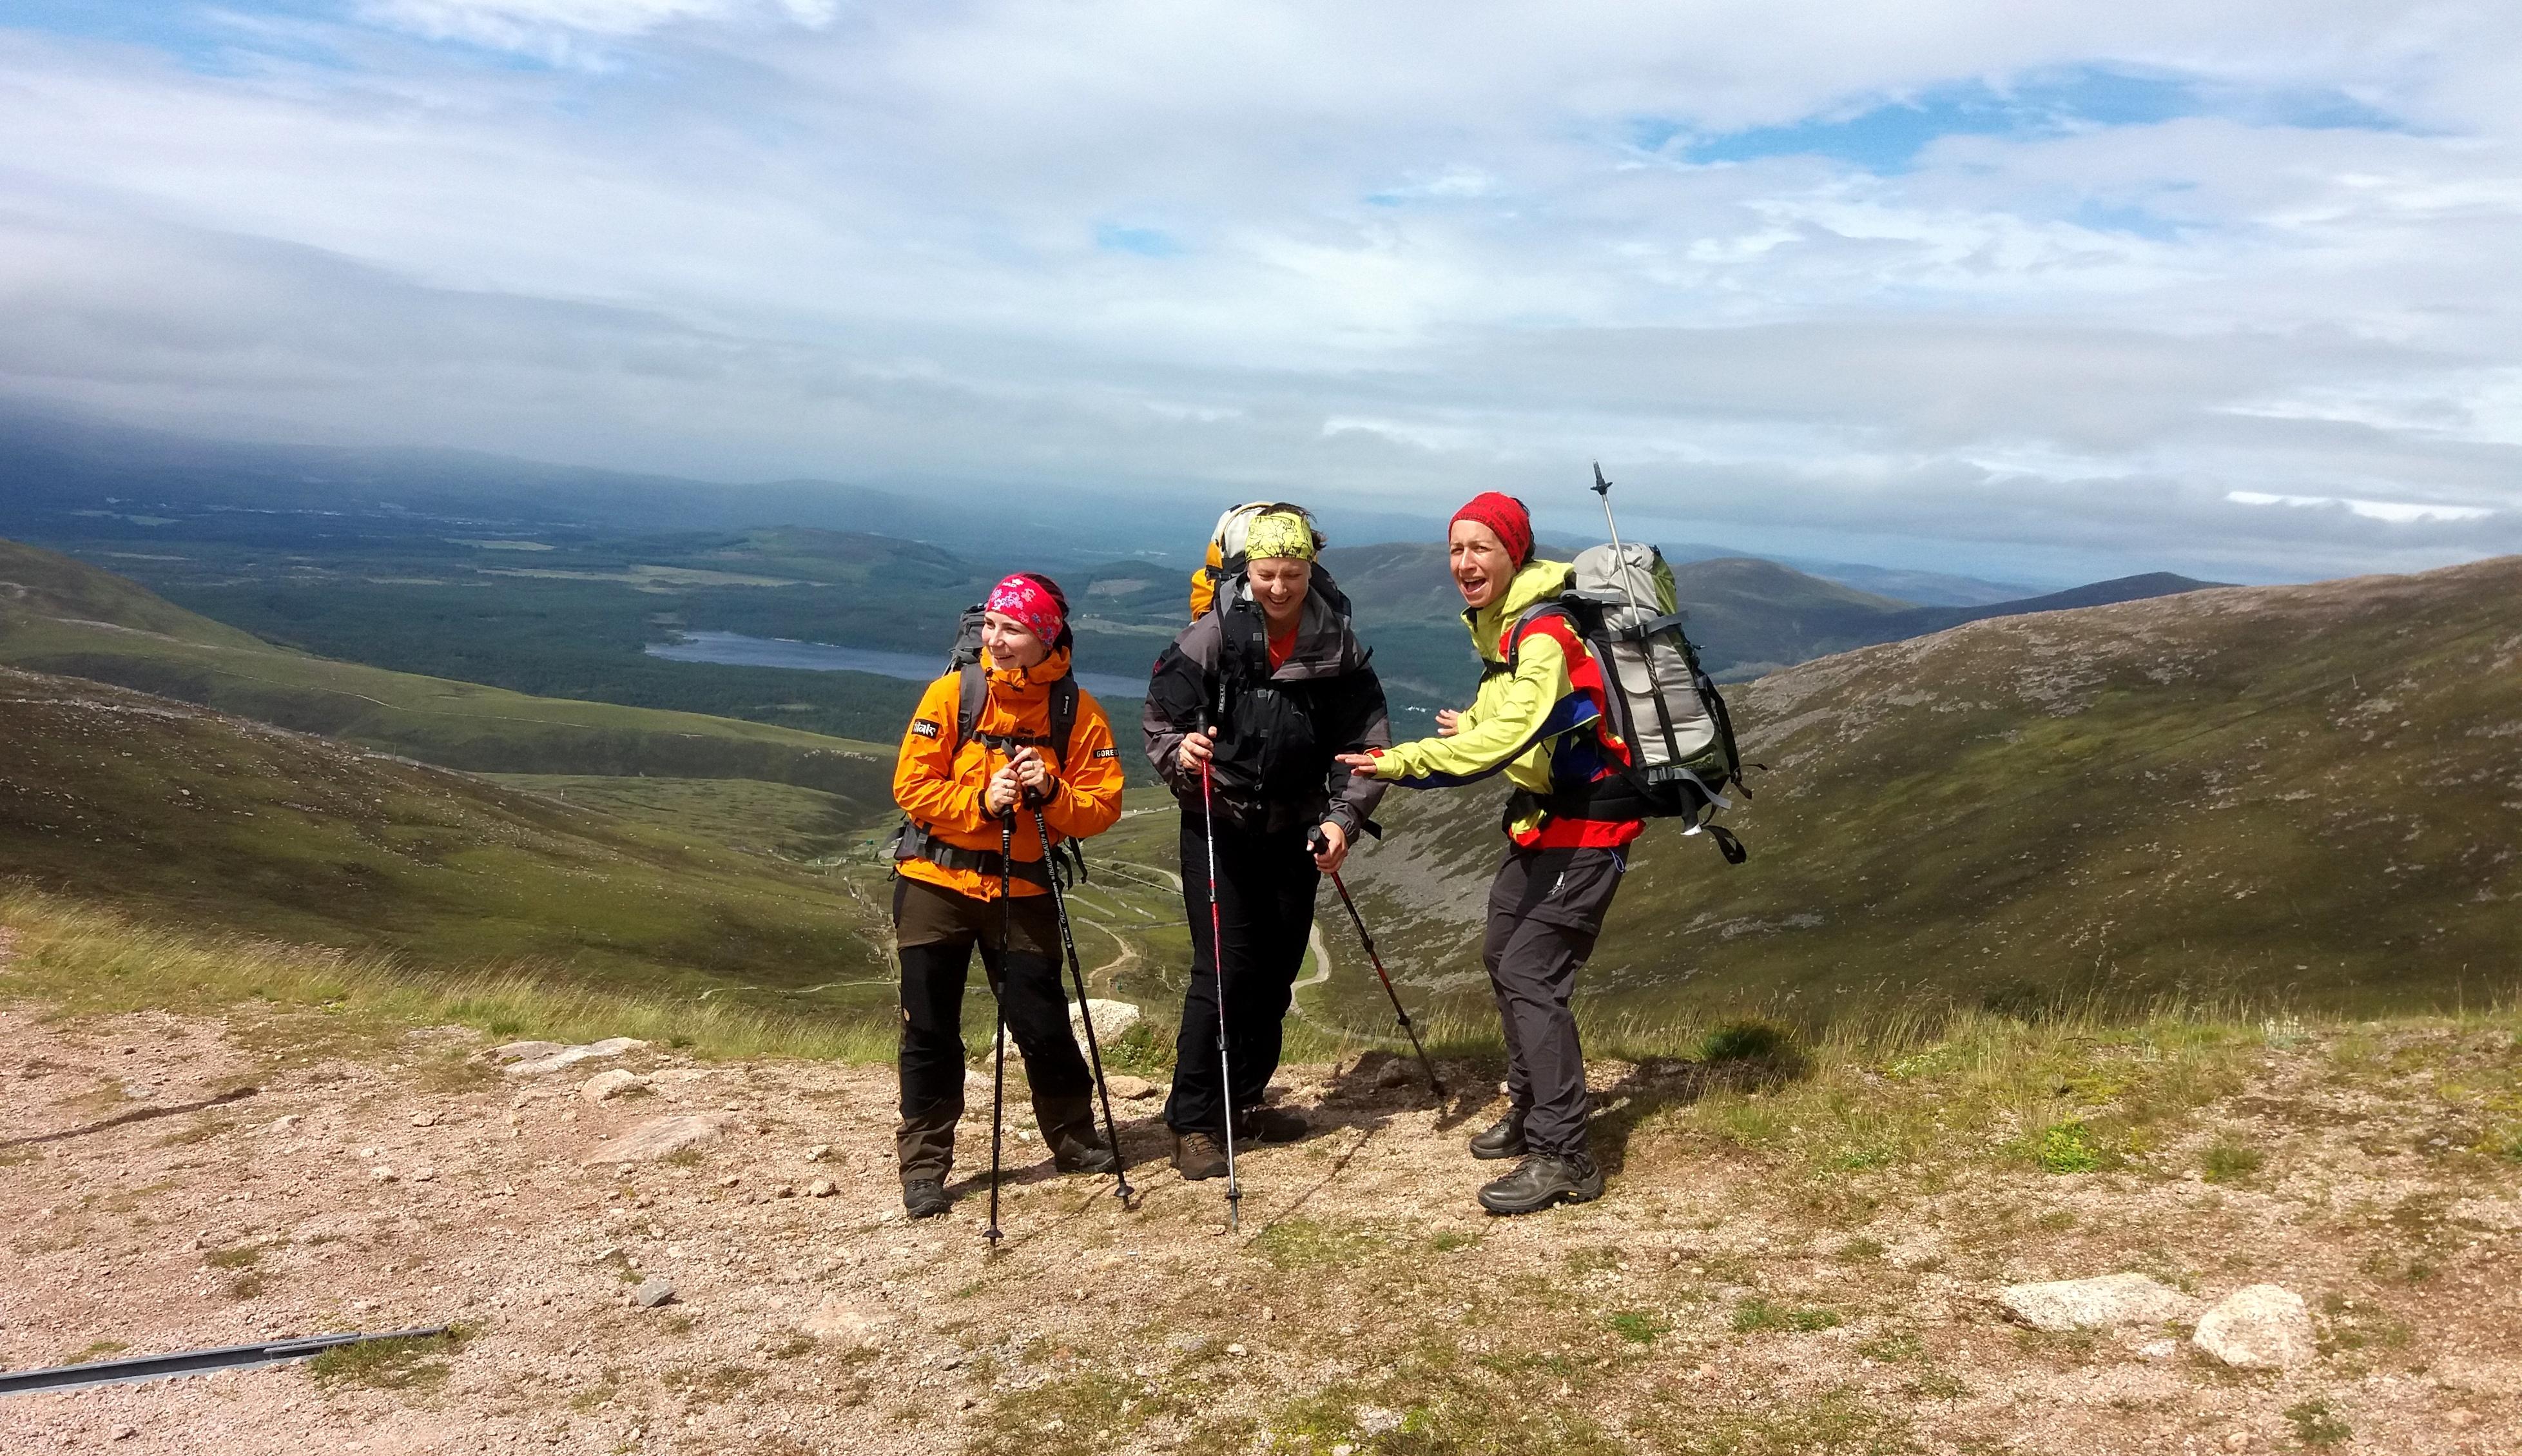 cestou na vrchol Cairn Gorm 1244 m